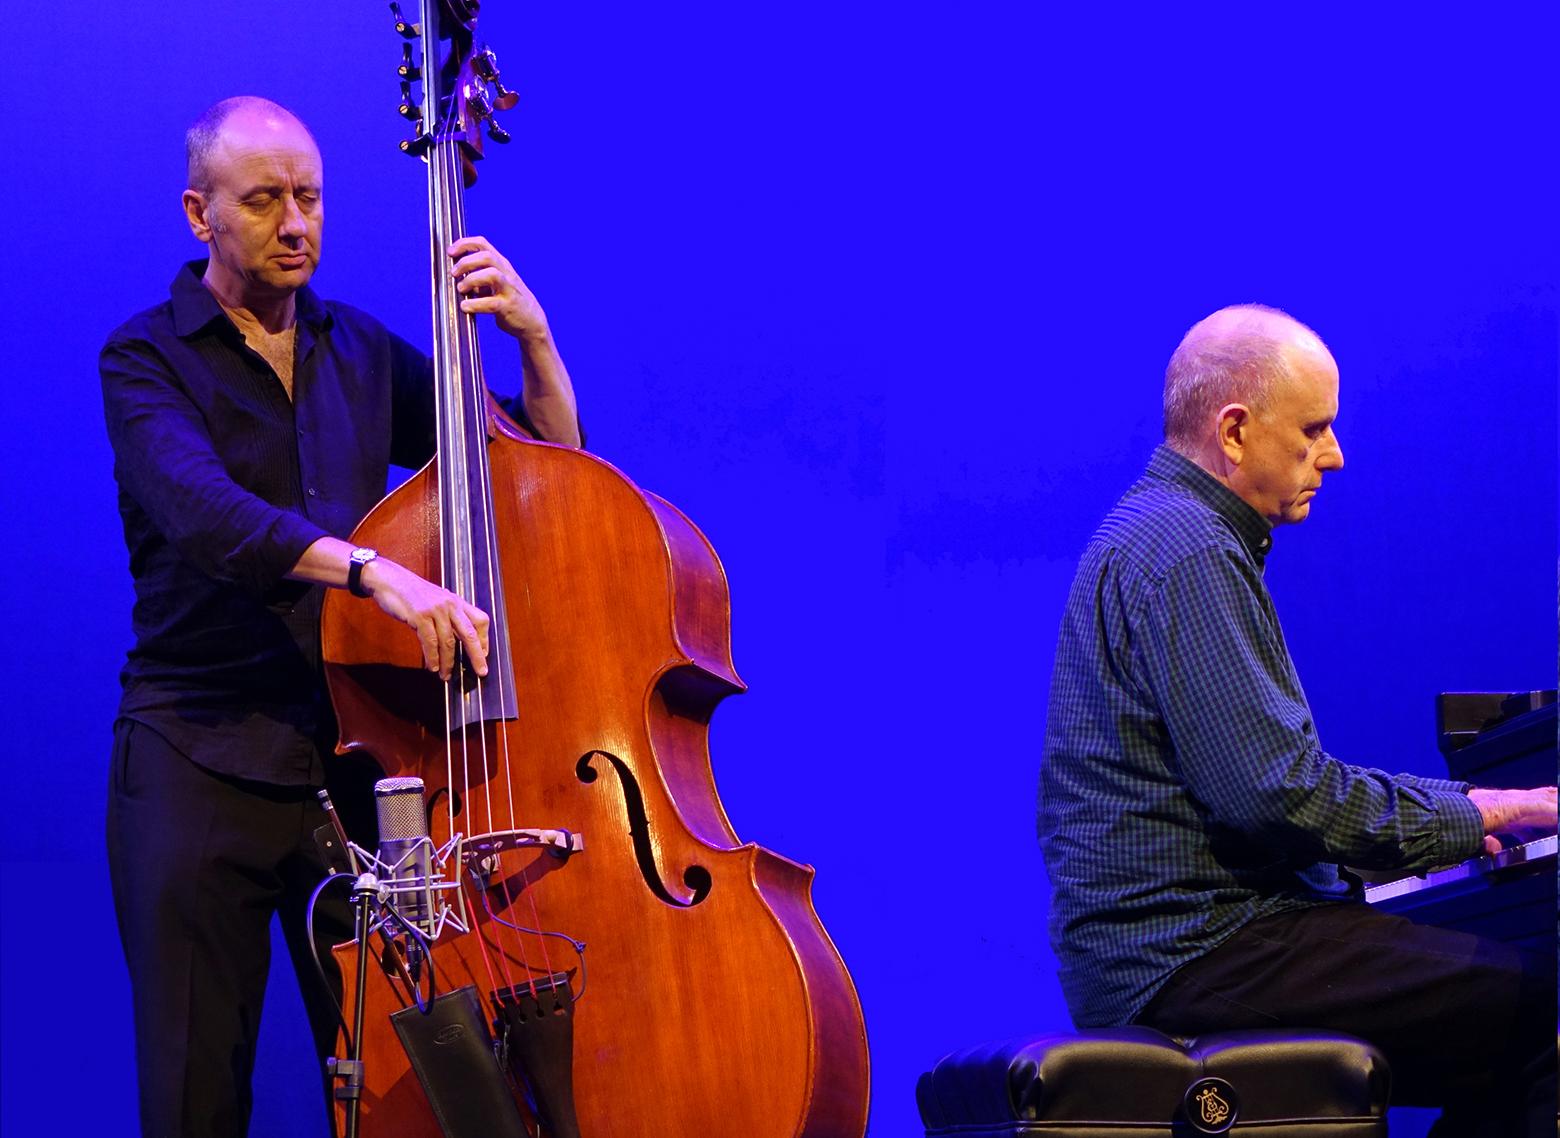 Lloyd Swanton & Chris Abrahams -- The Necks in Houston